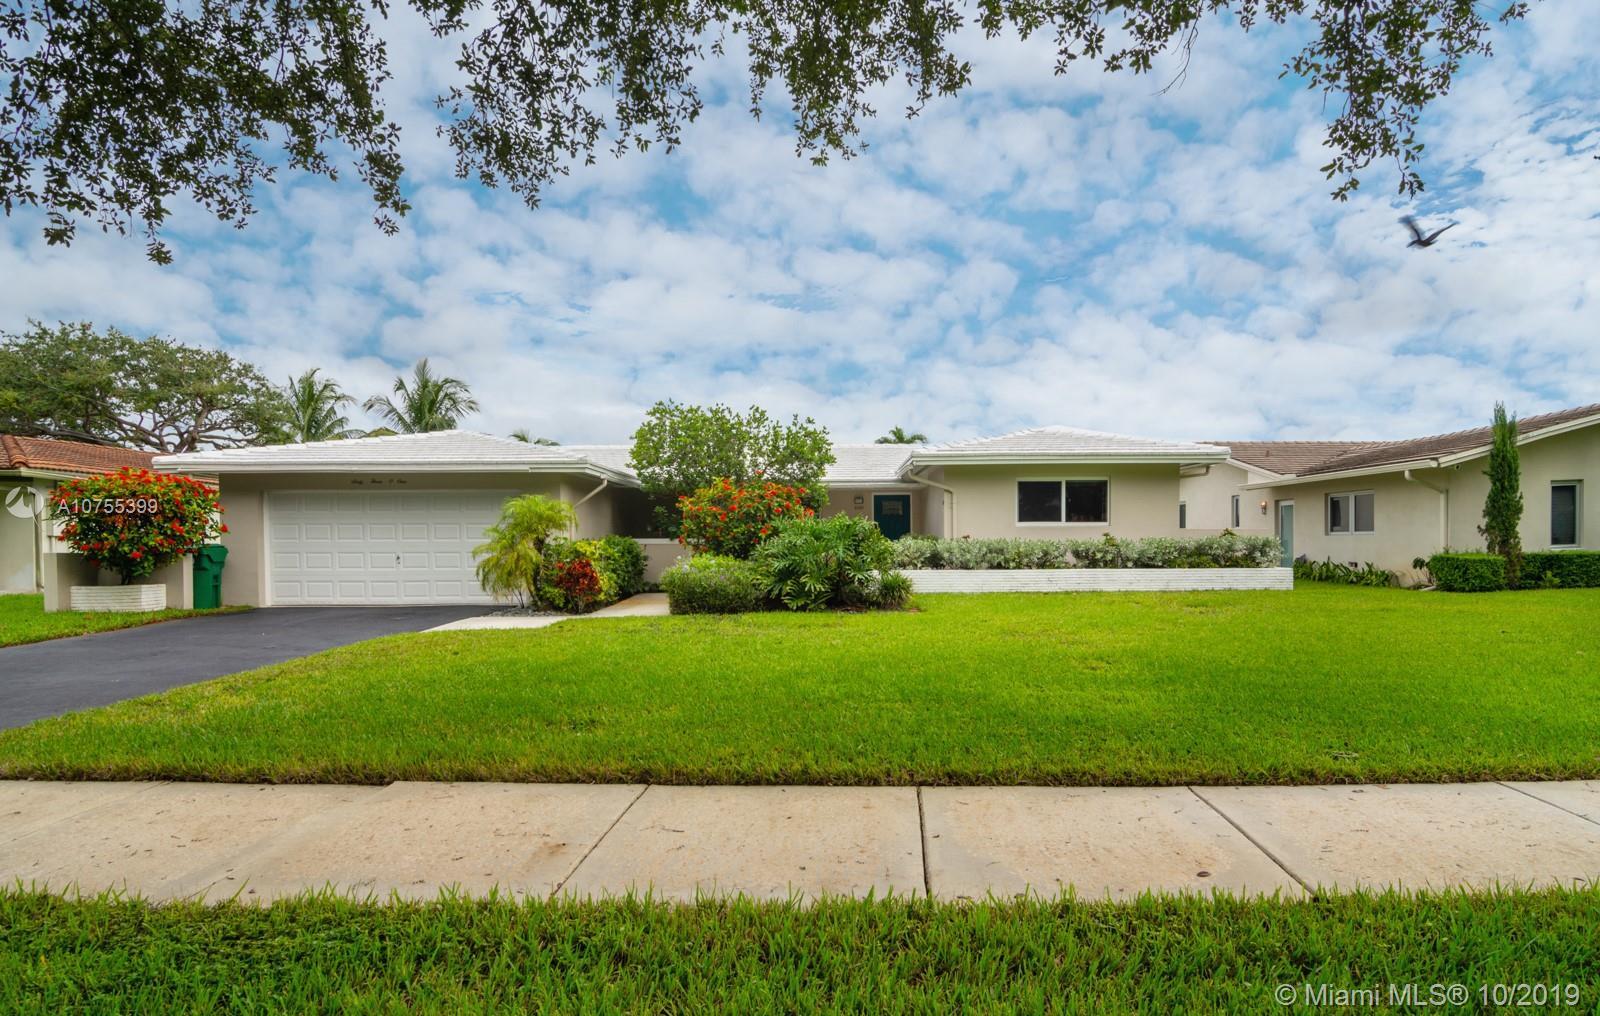 6301 Lake Patricia Dr, Miami Lakes, FL 33014